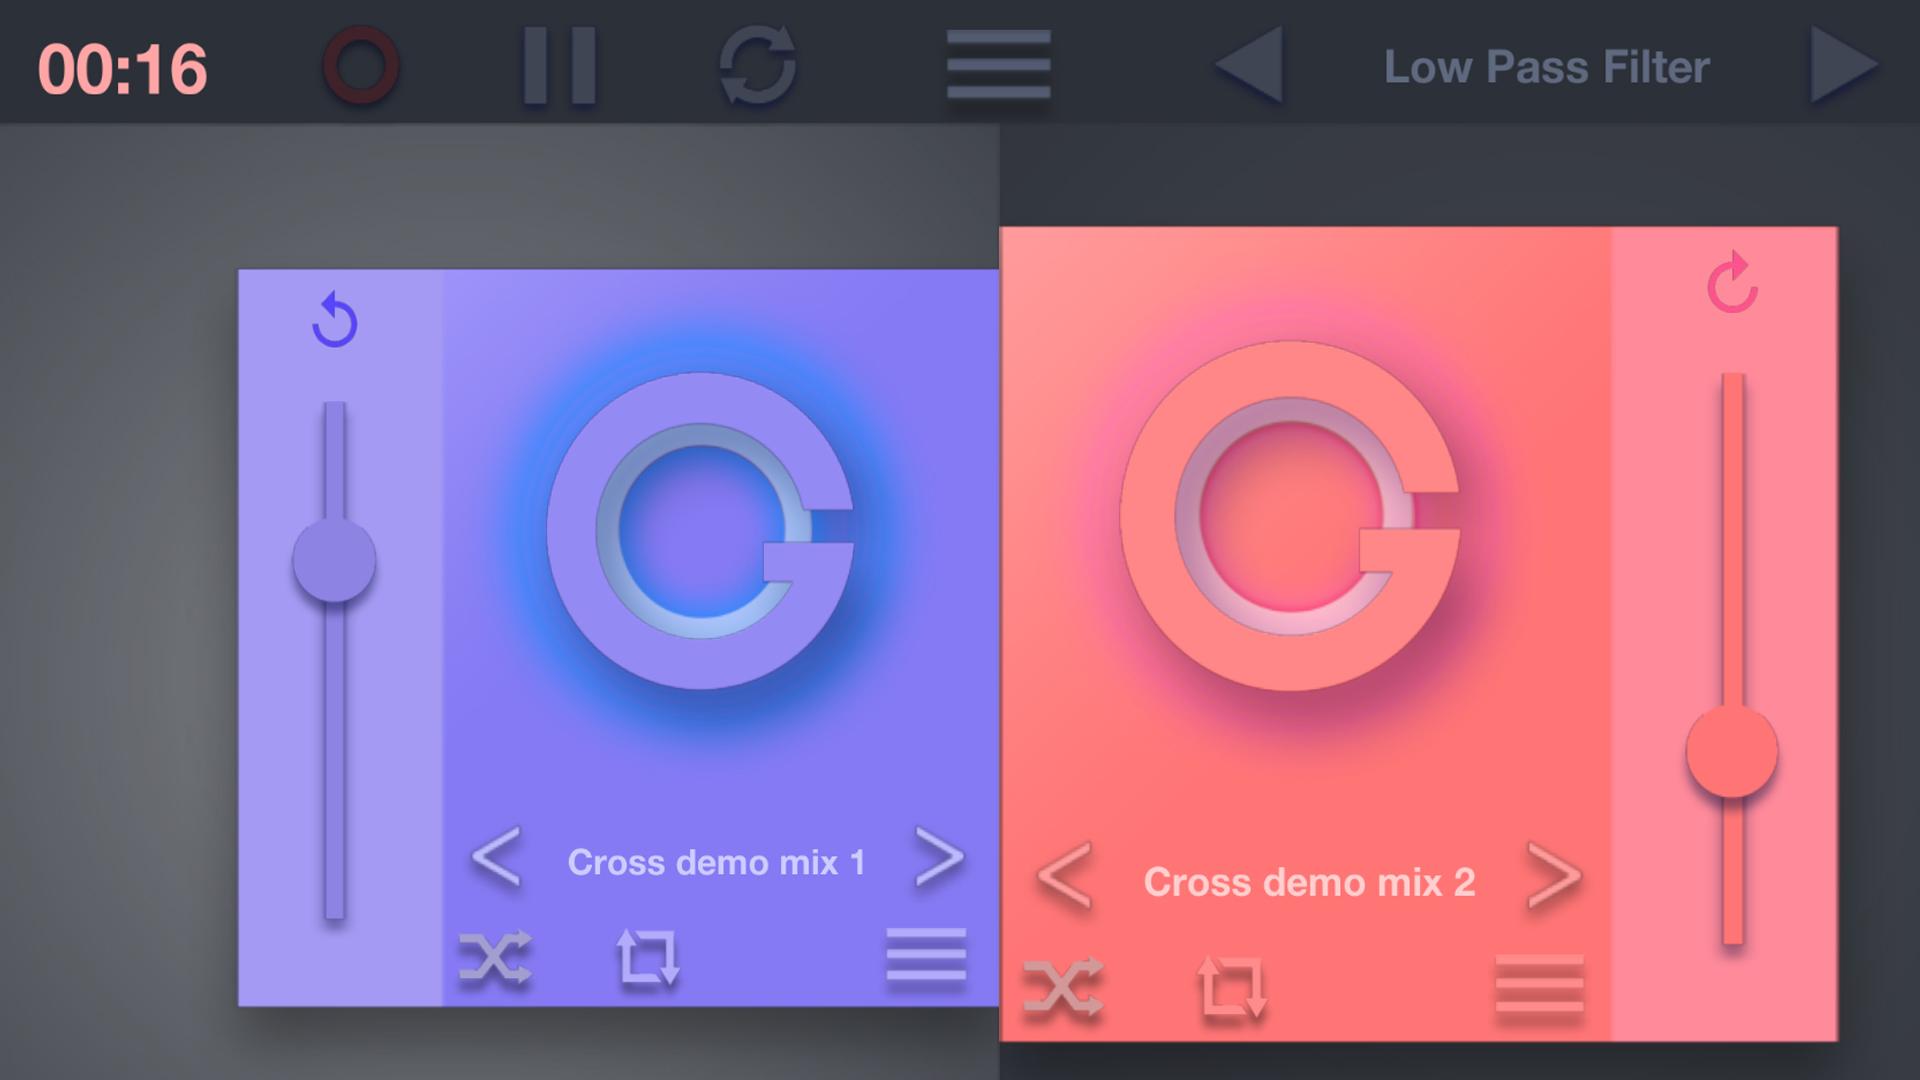 Crossfade Dj - Music & audio mixer player free: Amazon co uk